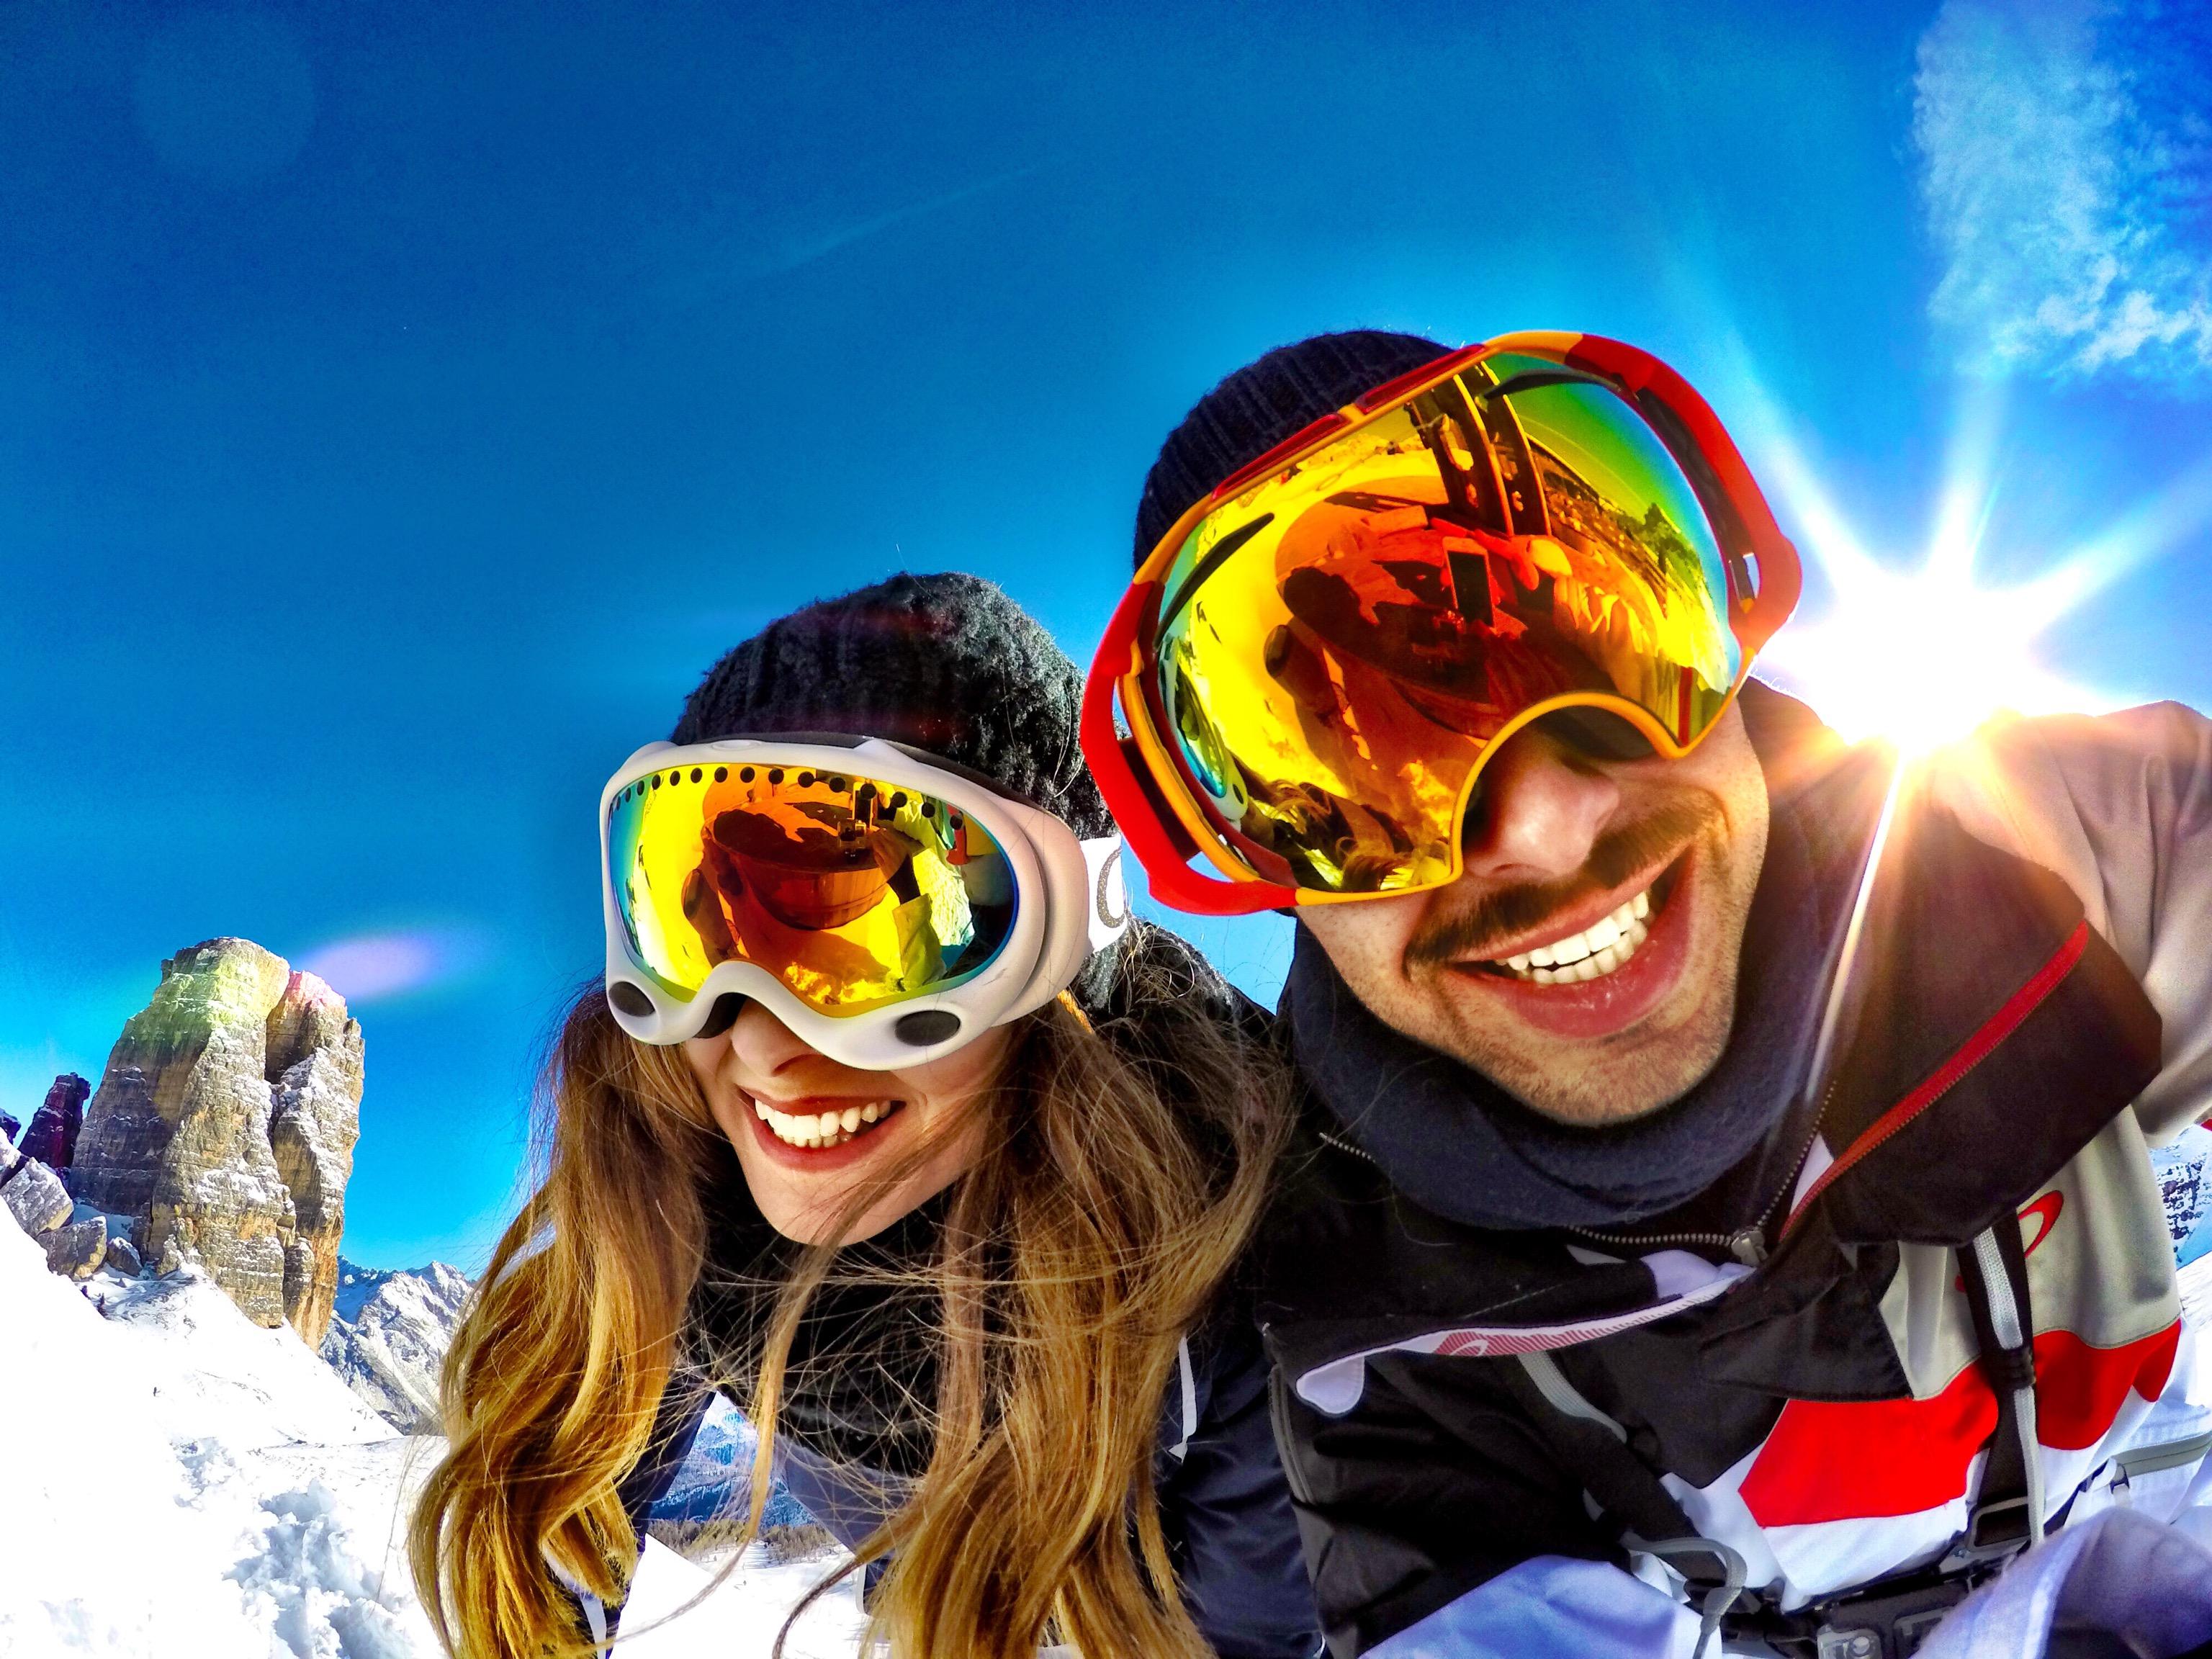 Federico Romano people skiing - Scoopshot